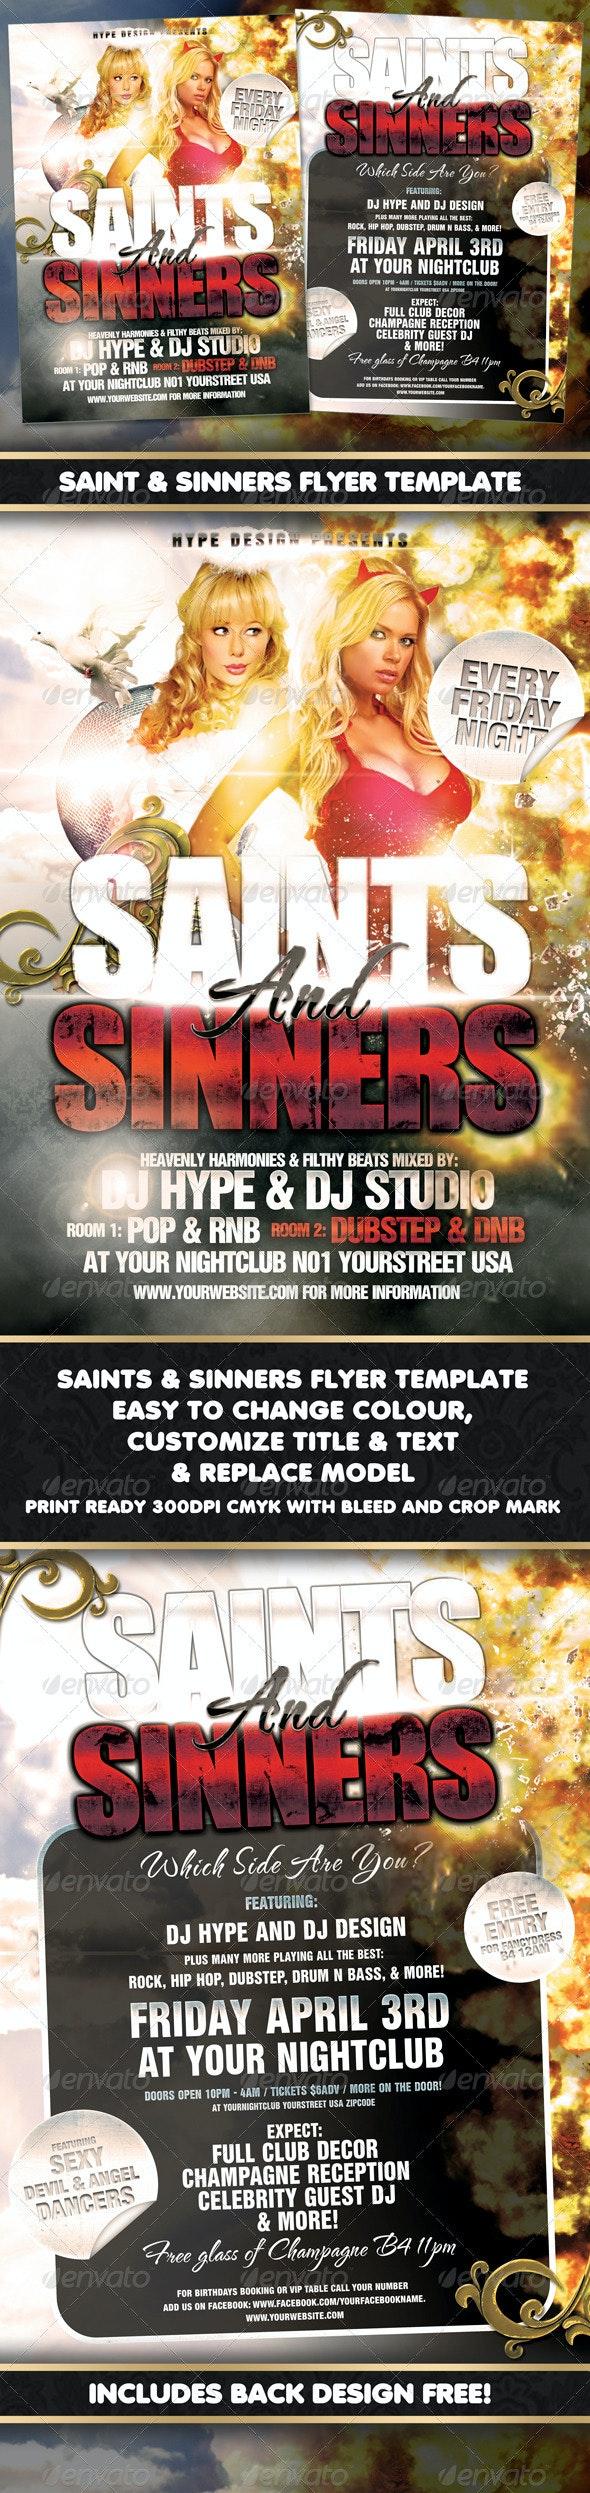 Saints & Sinners Flyer Template - Flyers Print Templates